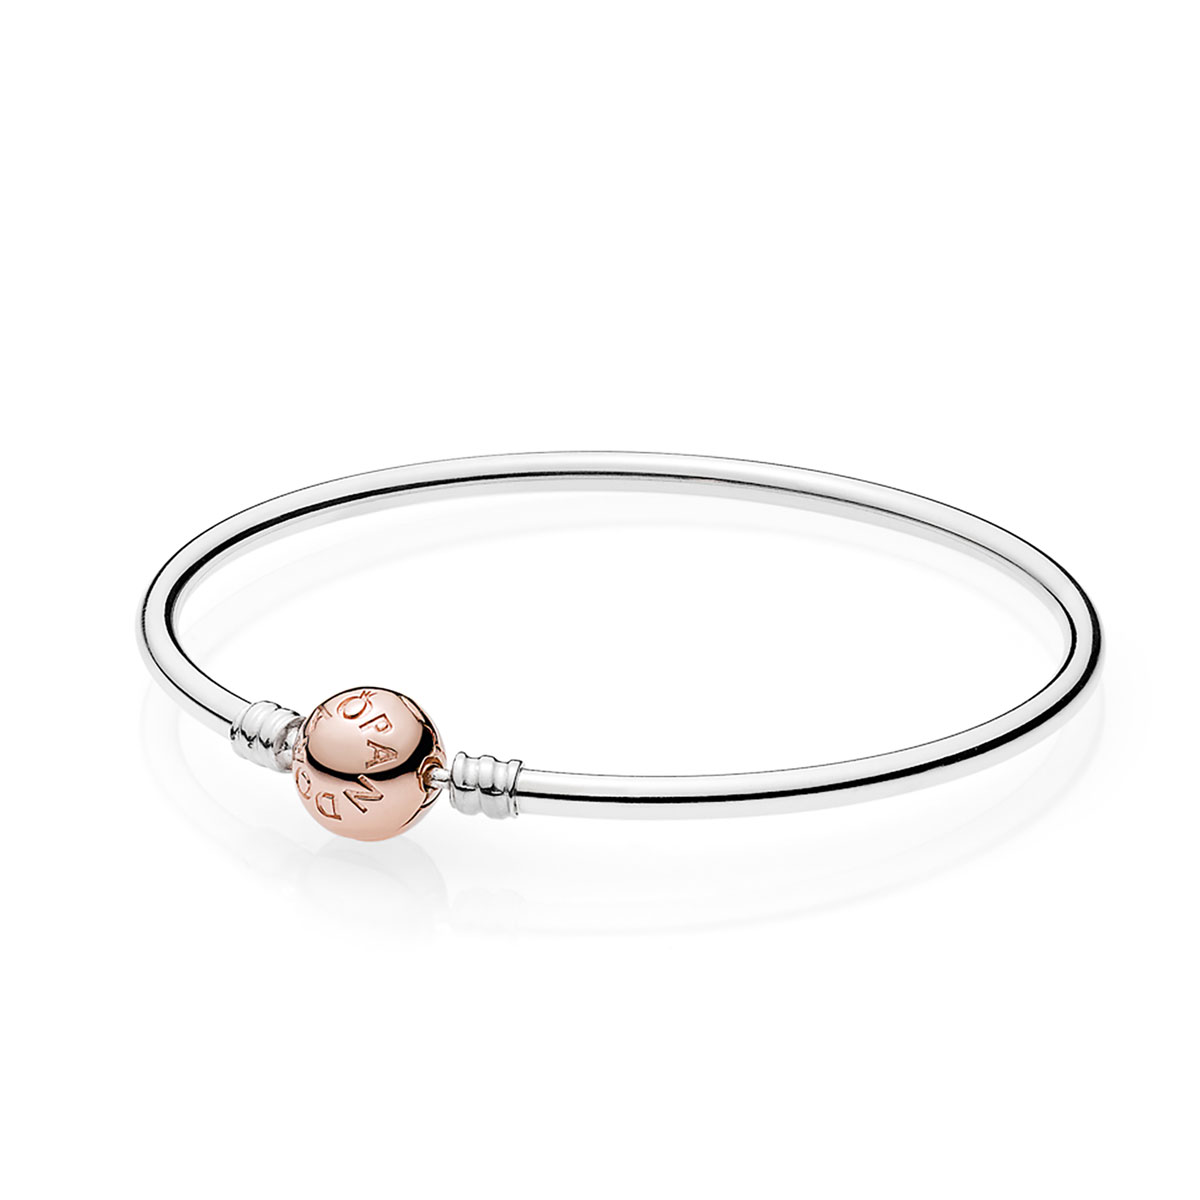 PANDORA Charm Bracelets Pancharmbraceletscom